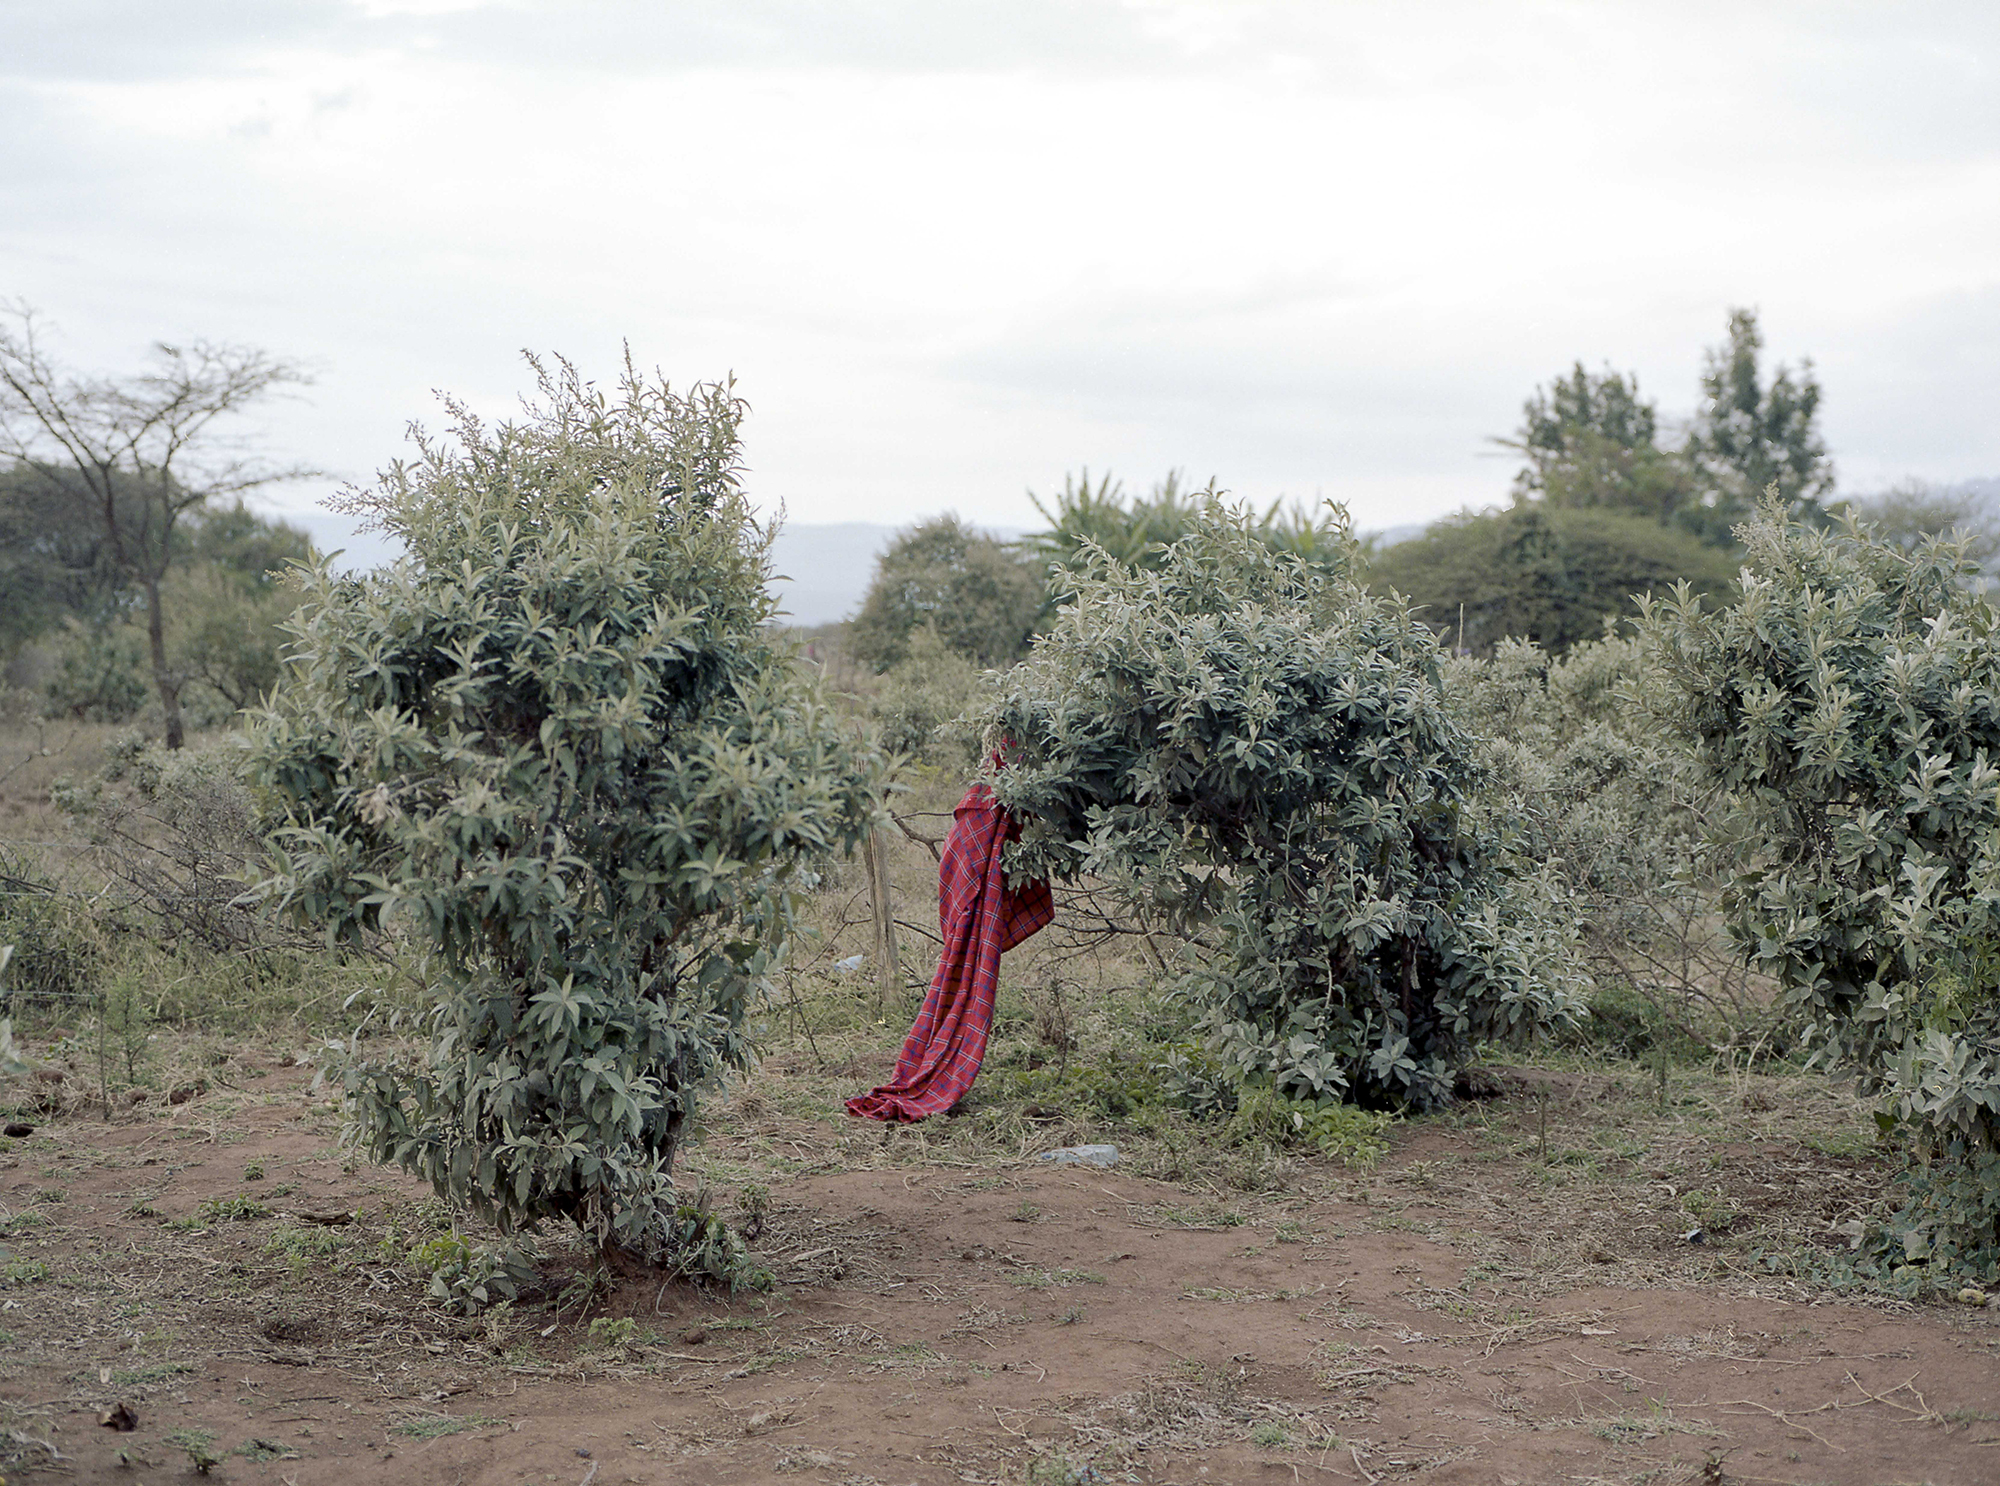 The Last Maasai By Adrien Blondel